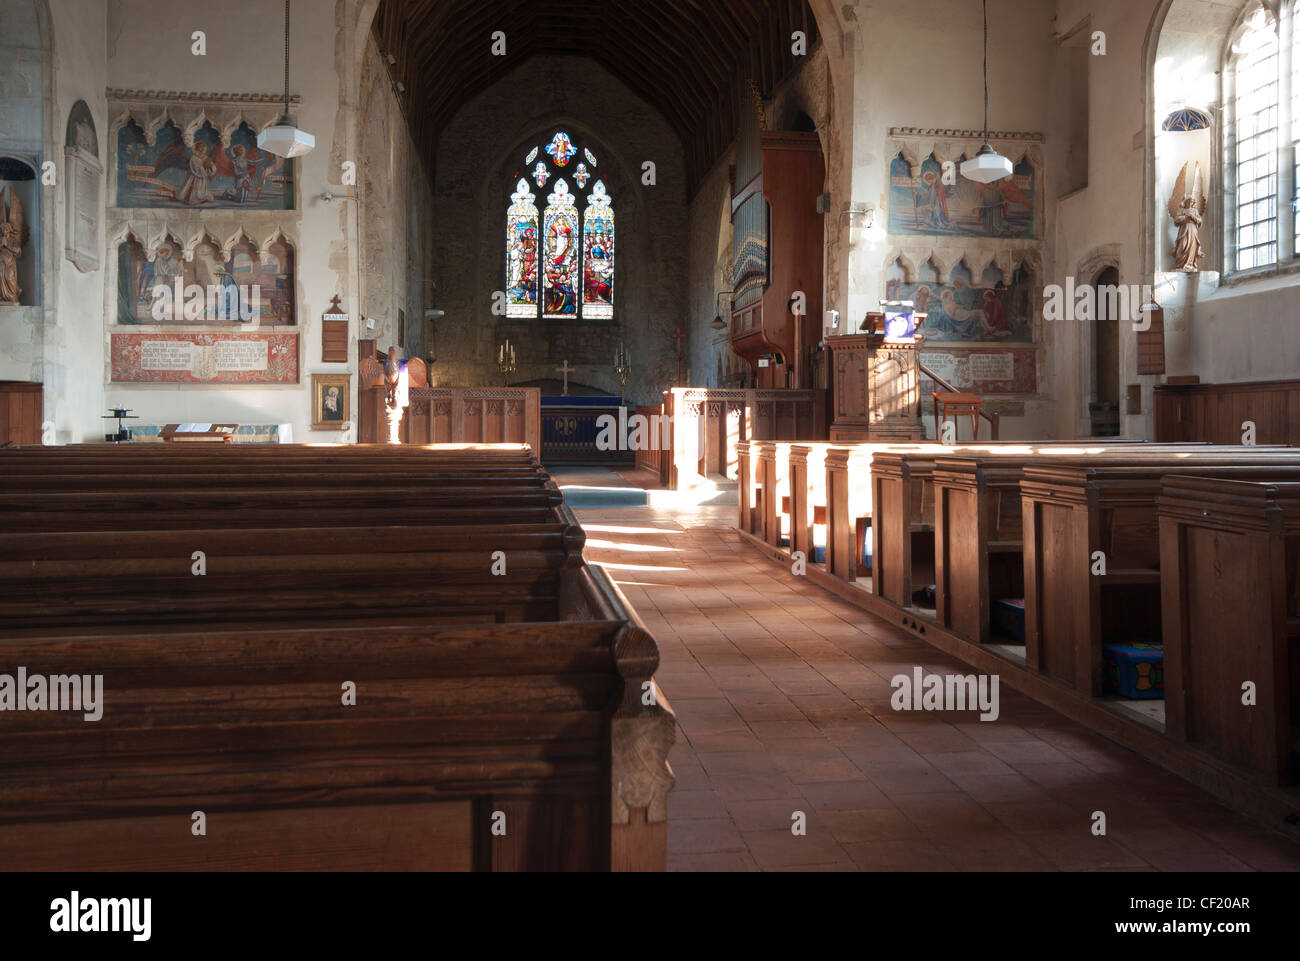 Inside Interior Of St Saint Michael The Archangel Parish Church Smarden Kent UK Village Churches - Stock Image